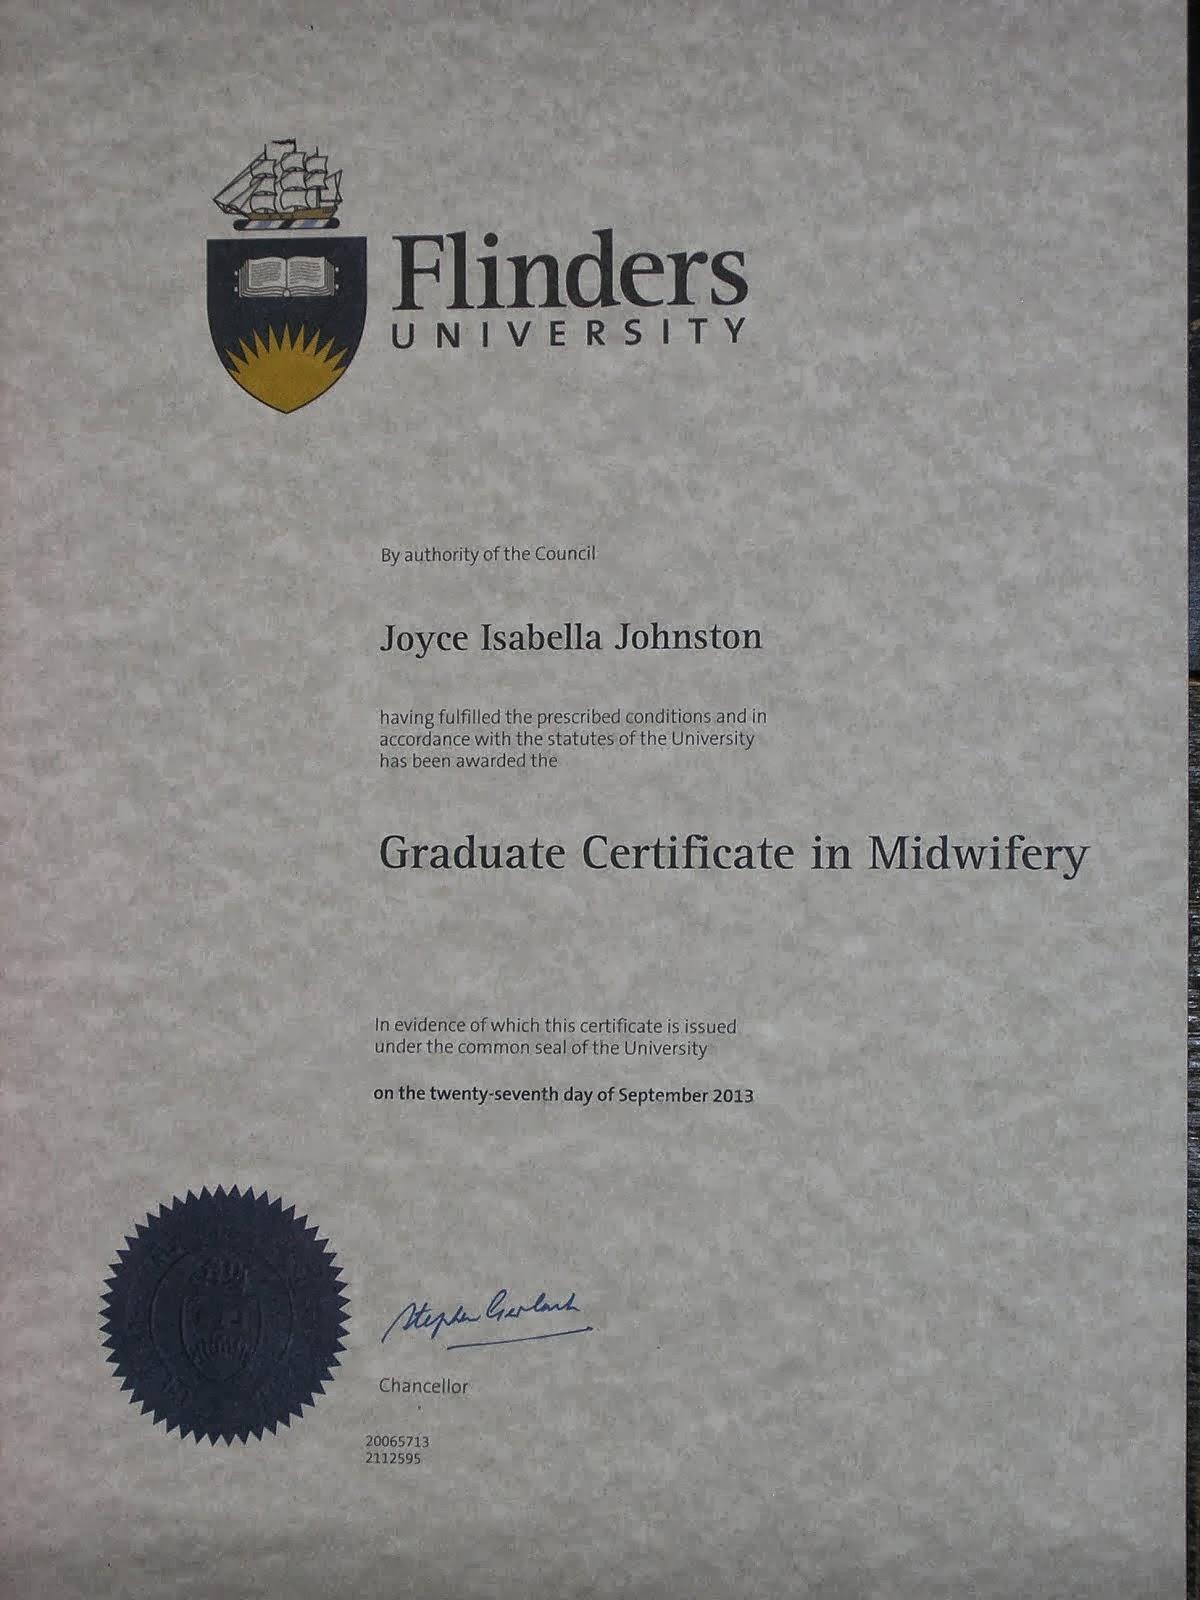 Graduate Certificate in Midwifery